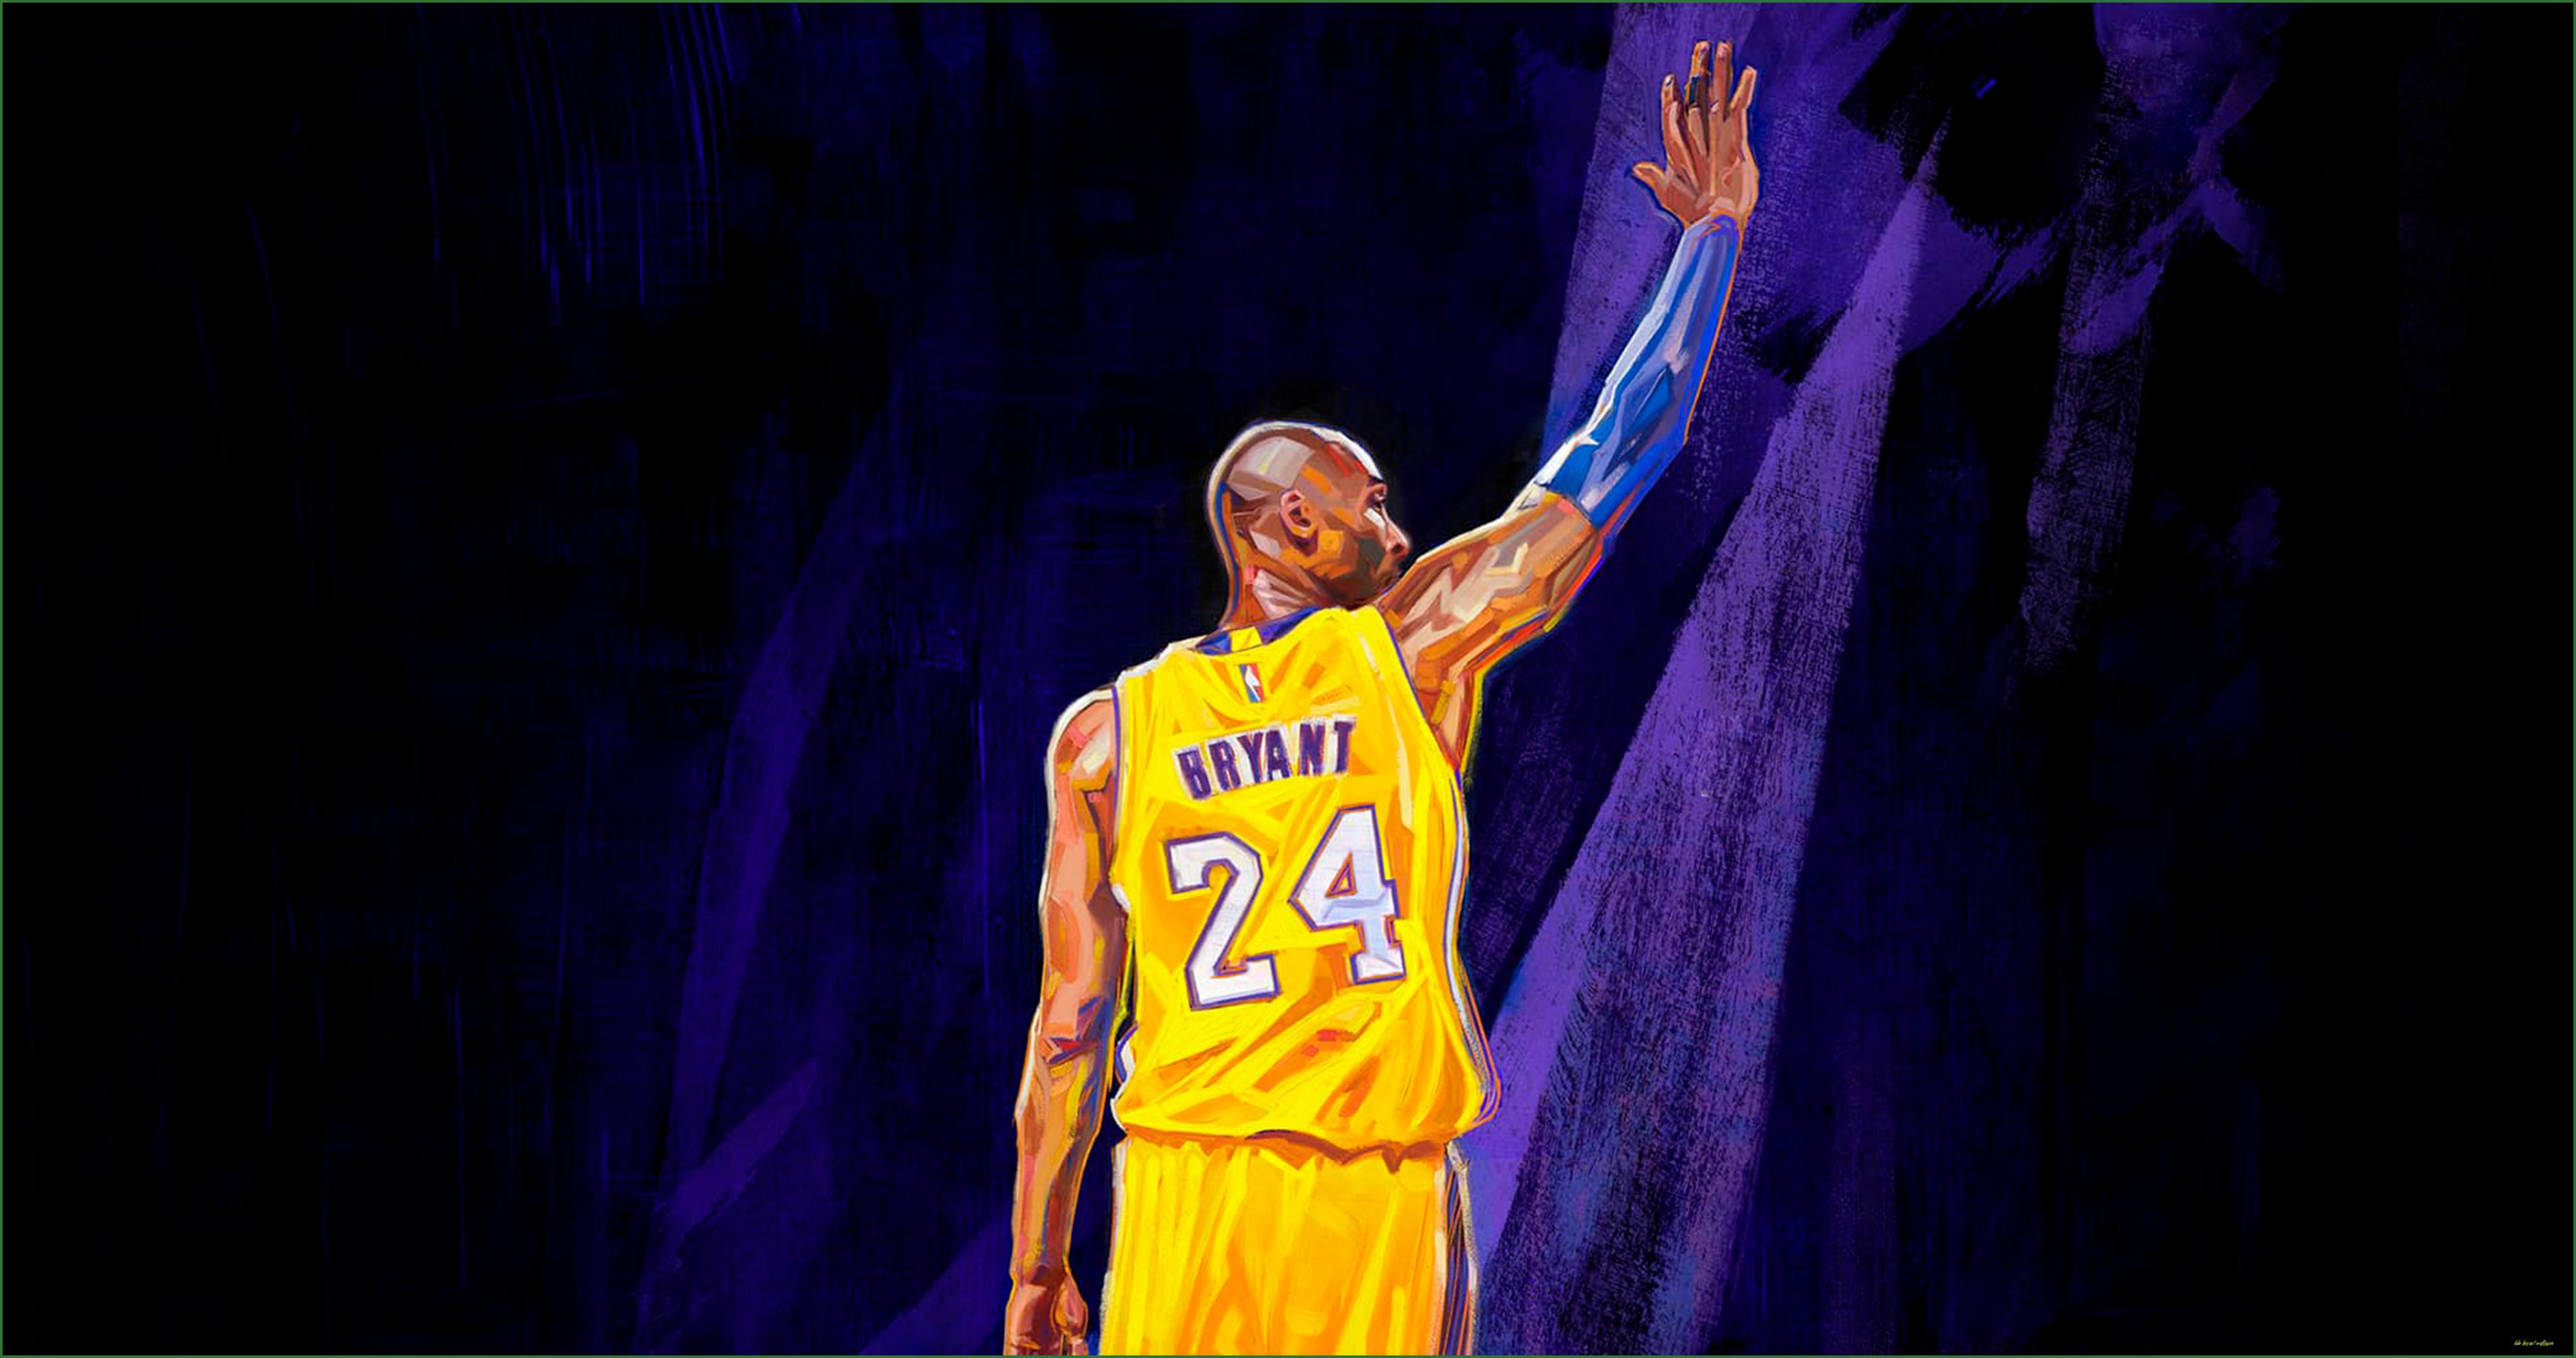 Five Important Life Lessons Kobe Bryant Wallpaper Taught Us Kobe Bryant Wallpaper Https Aestheticwall Com Five Impor Kobe Bryant Wallpaper Kobe Bryant Kobe